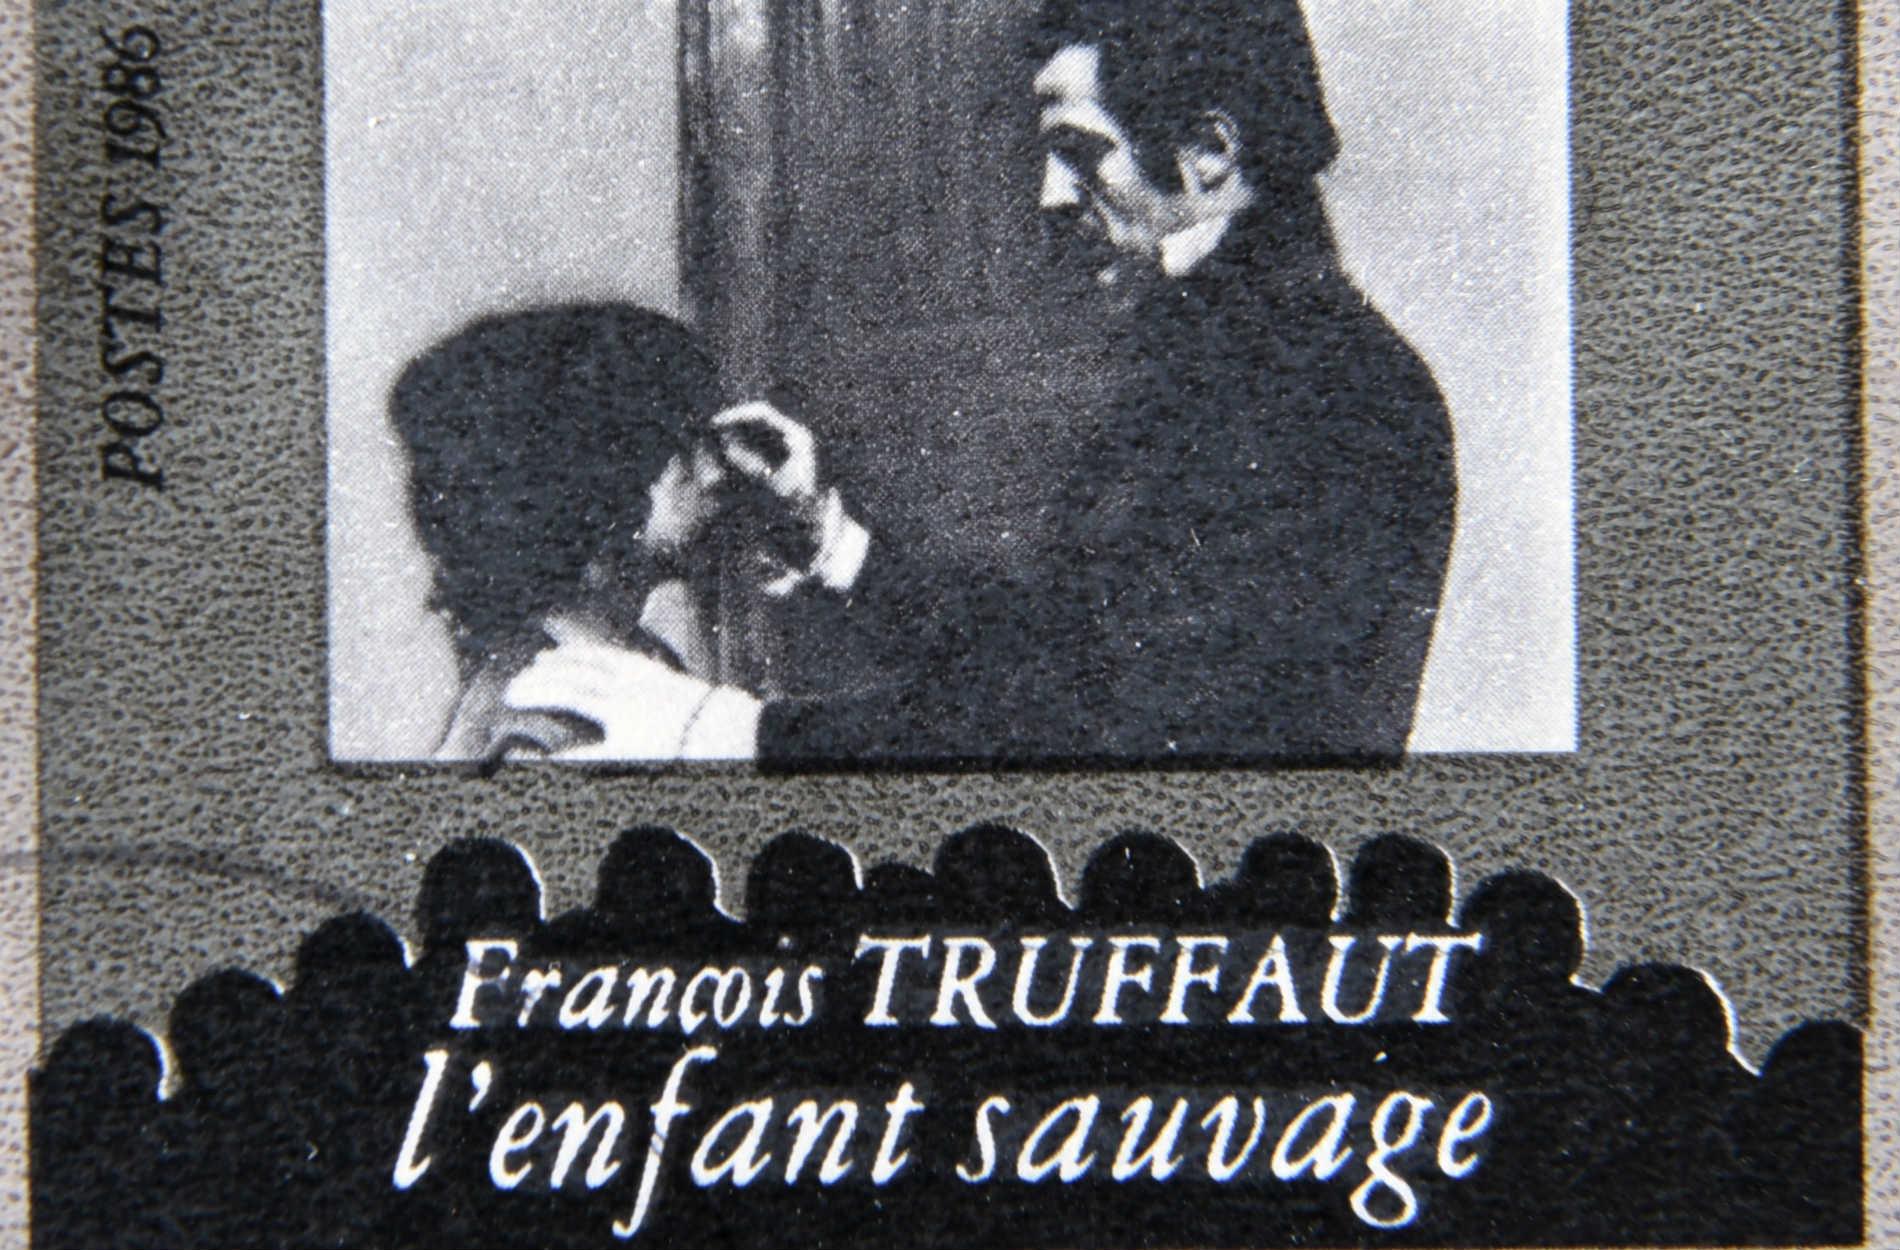 François Truffaut, director de cine francés.